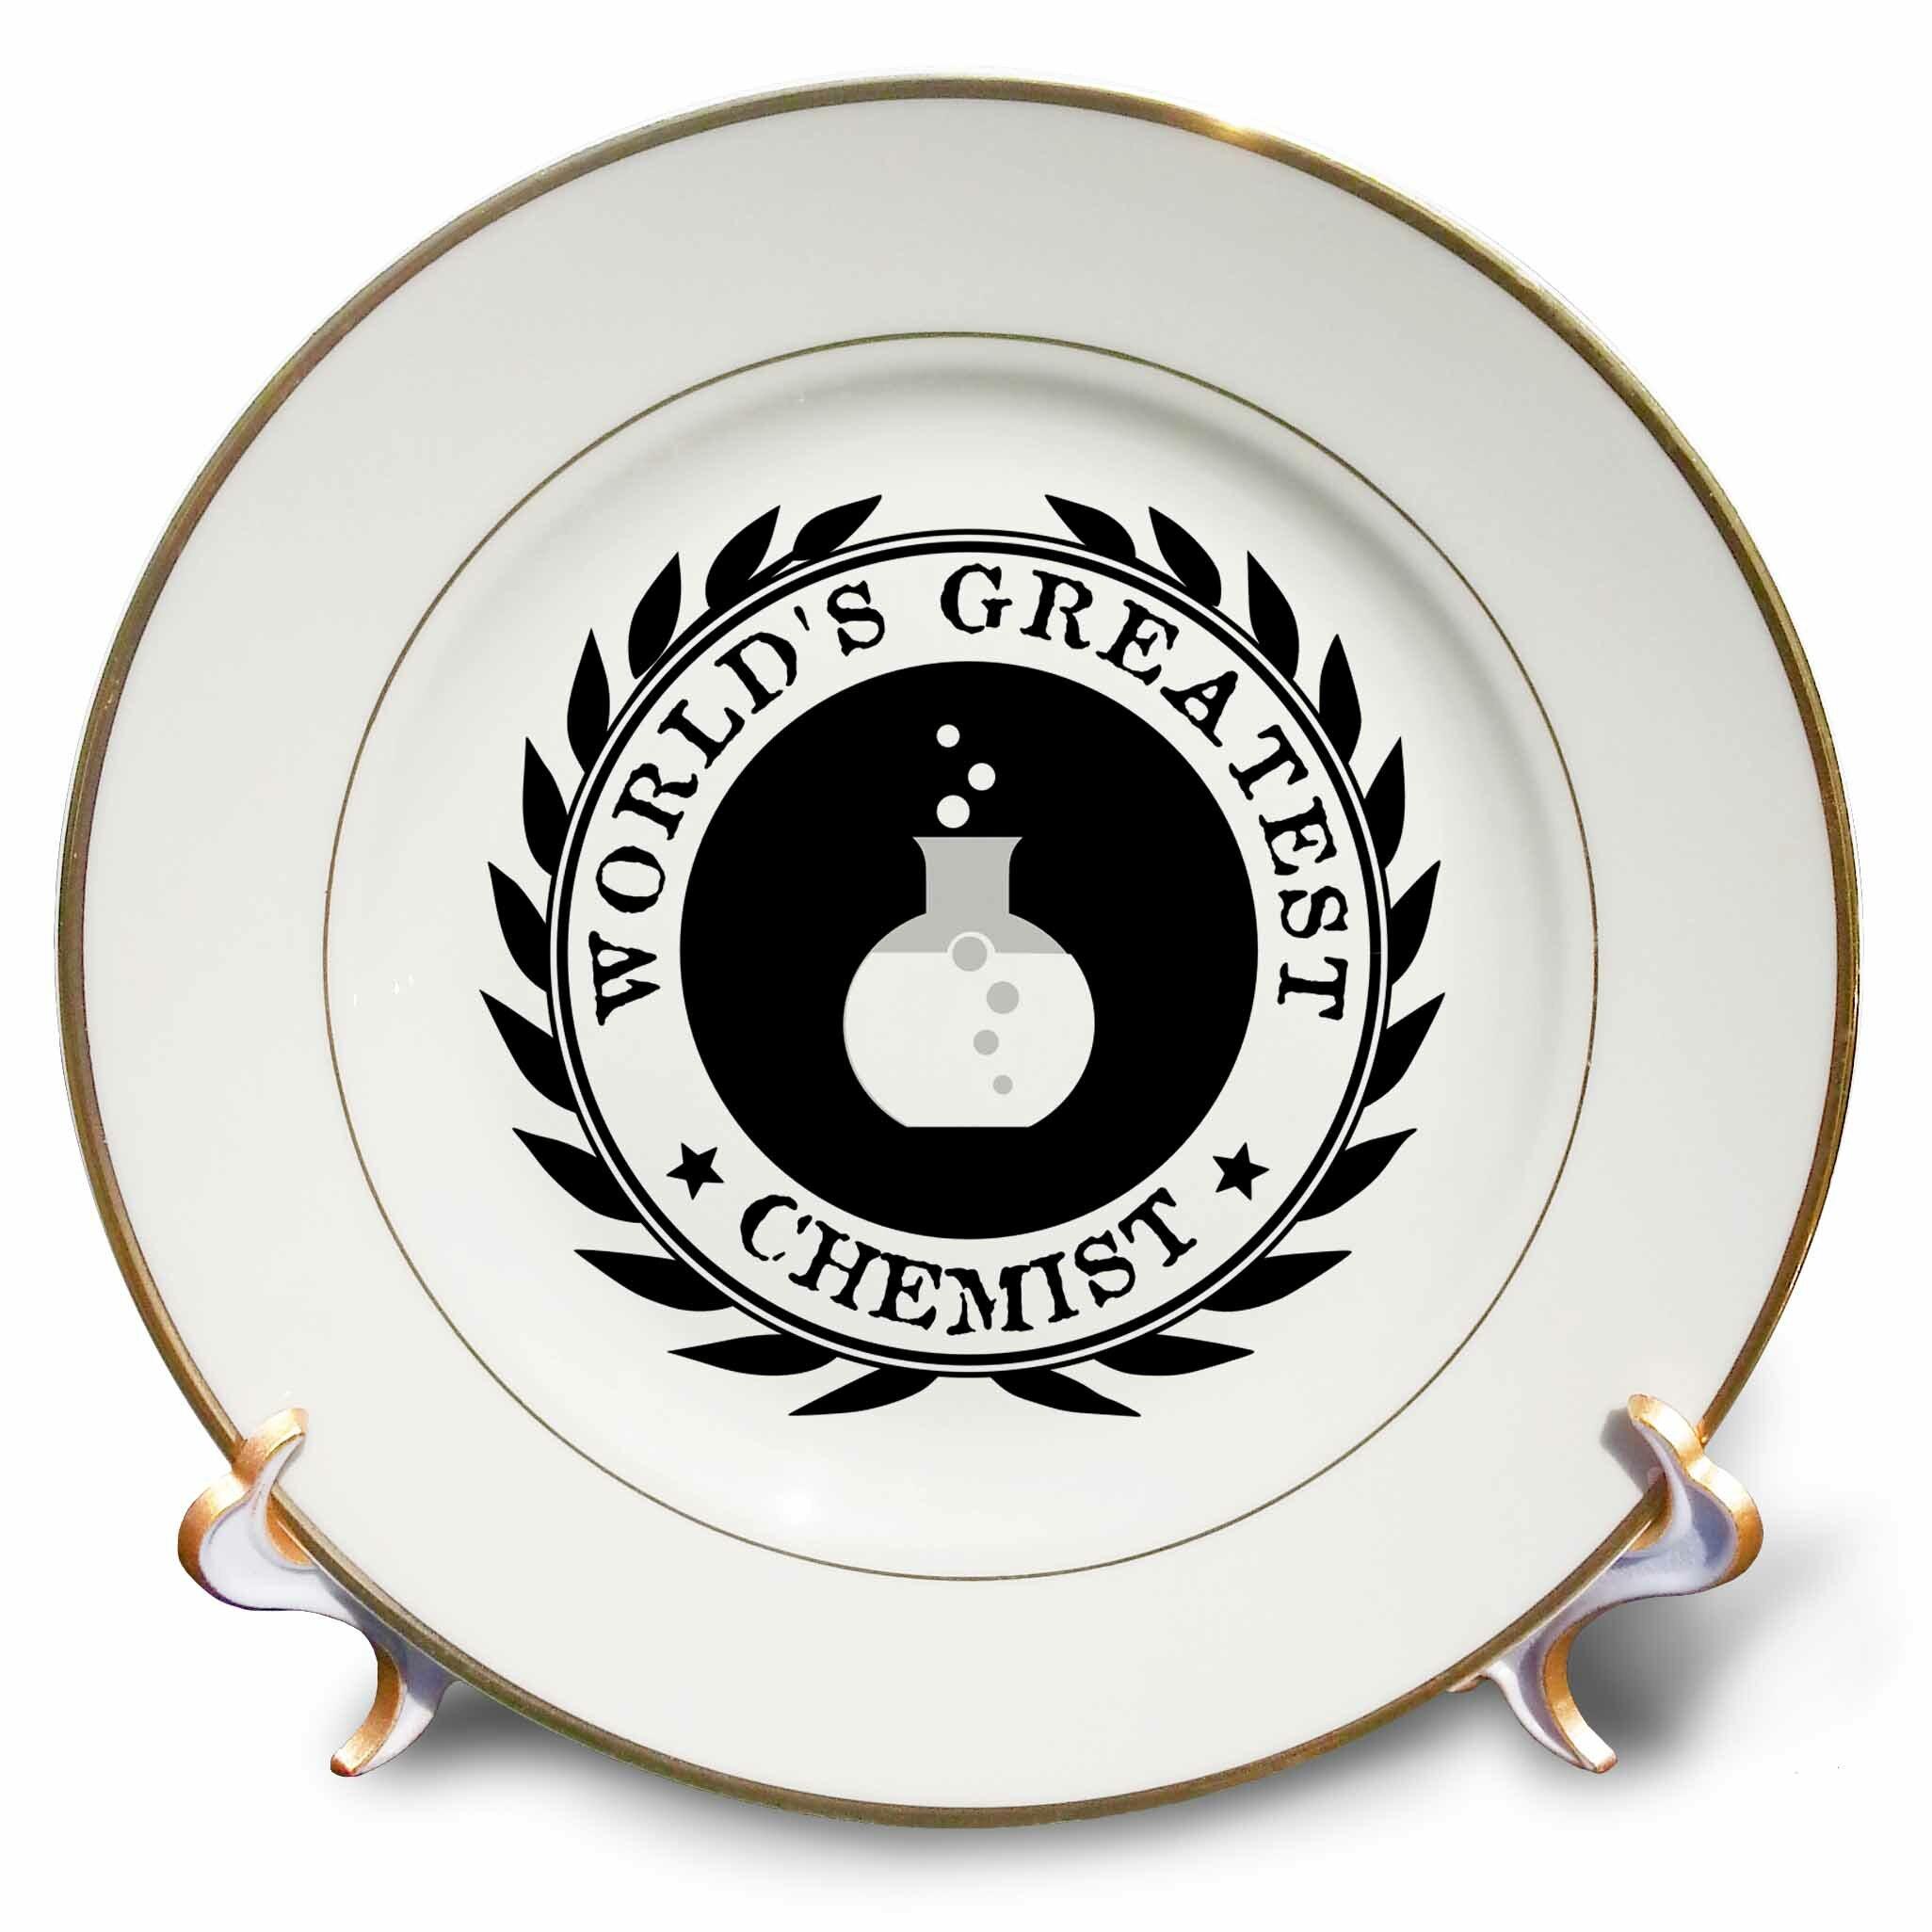 East Urban Home Worlds Greatest Chemist Chemistry Job Pride Badge Graphic Porcelain Decorative Plate Wayfair